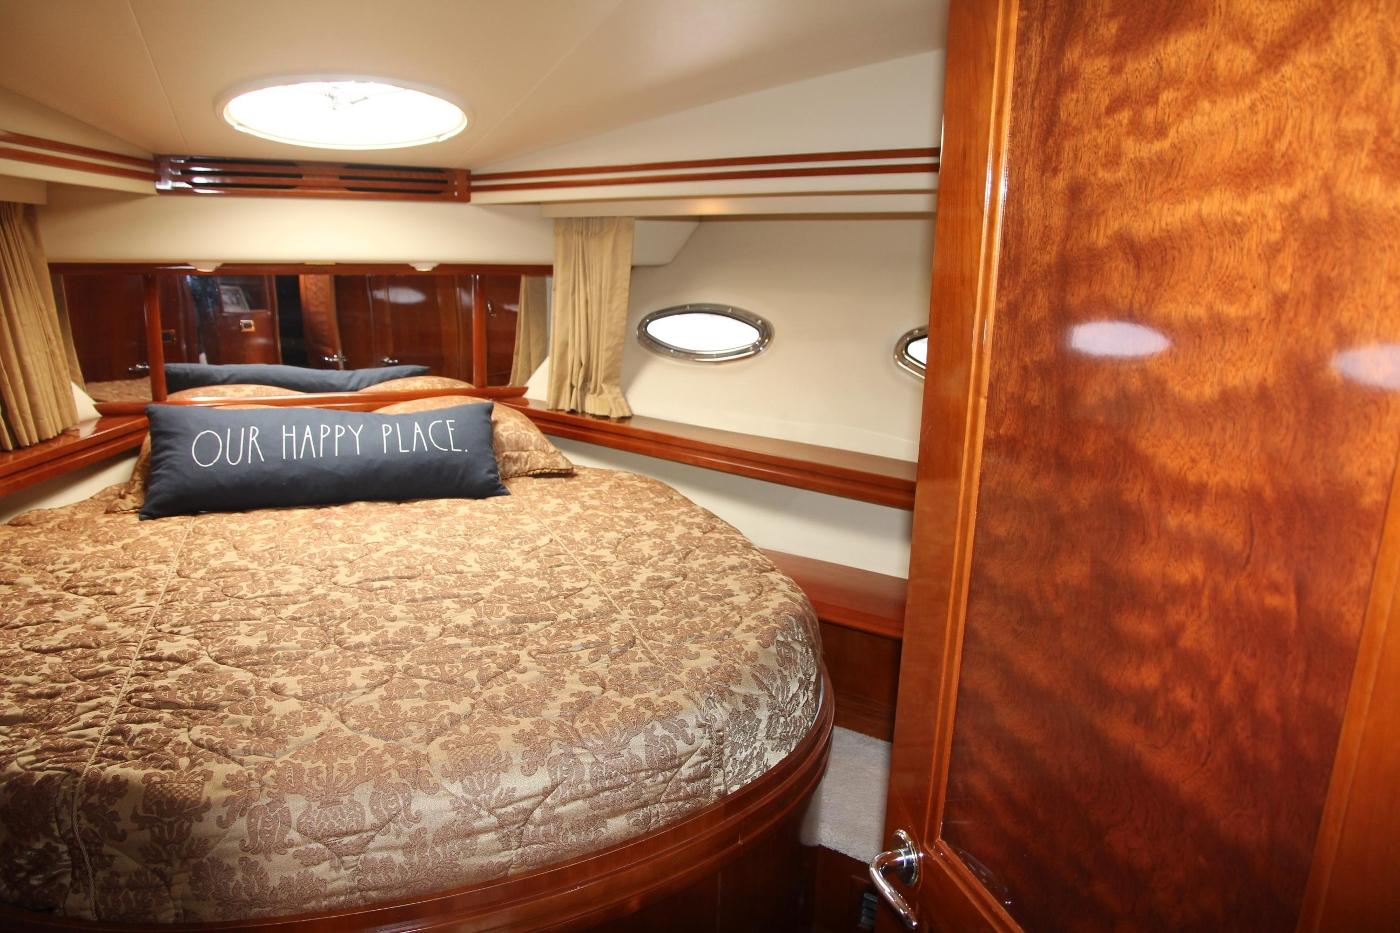 2005 Carver 560 Voyager Pilothouse, Forward VIP Cabin